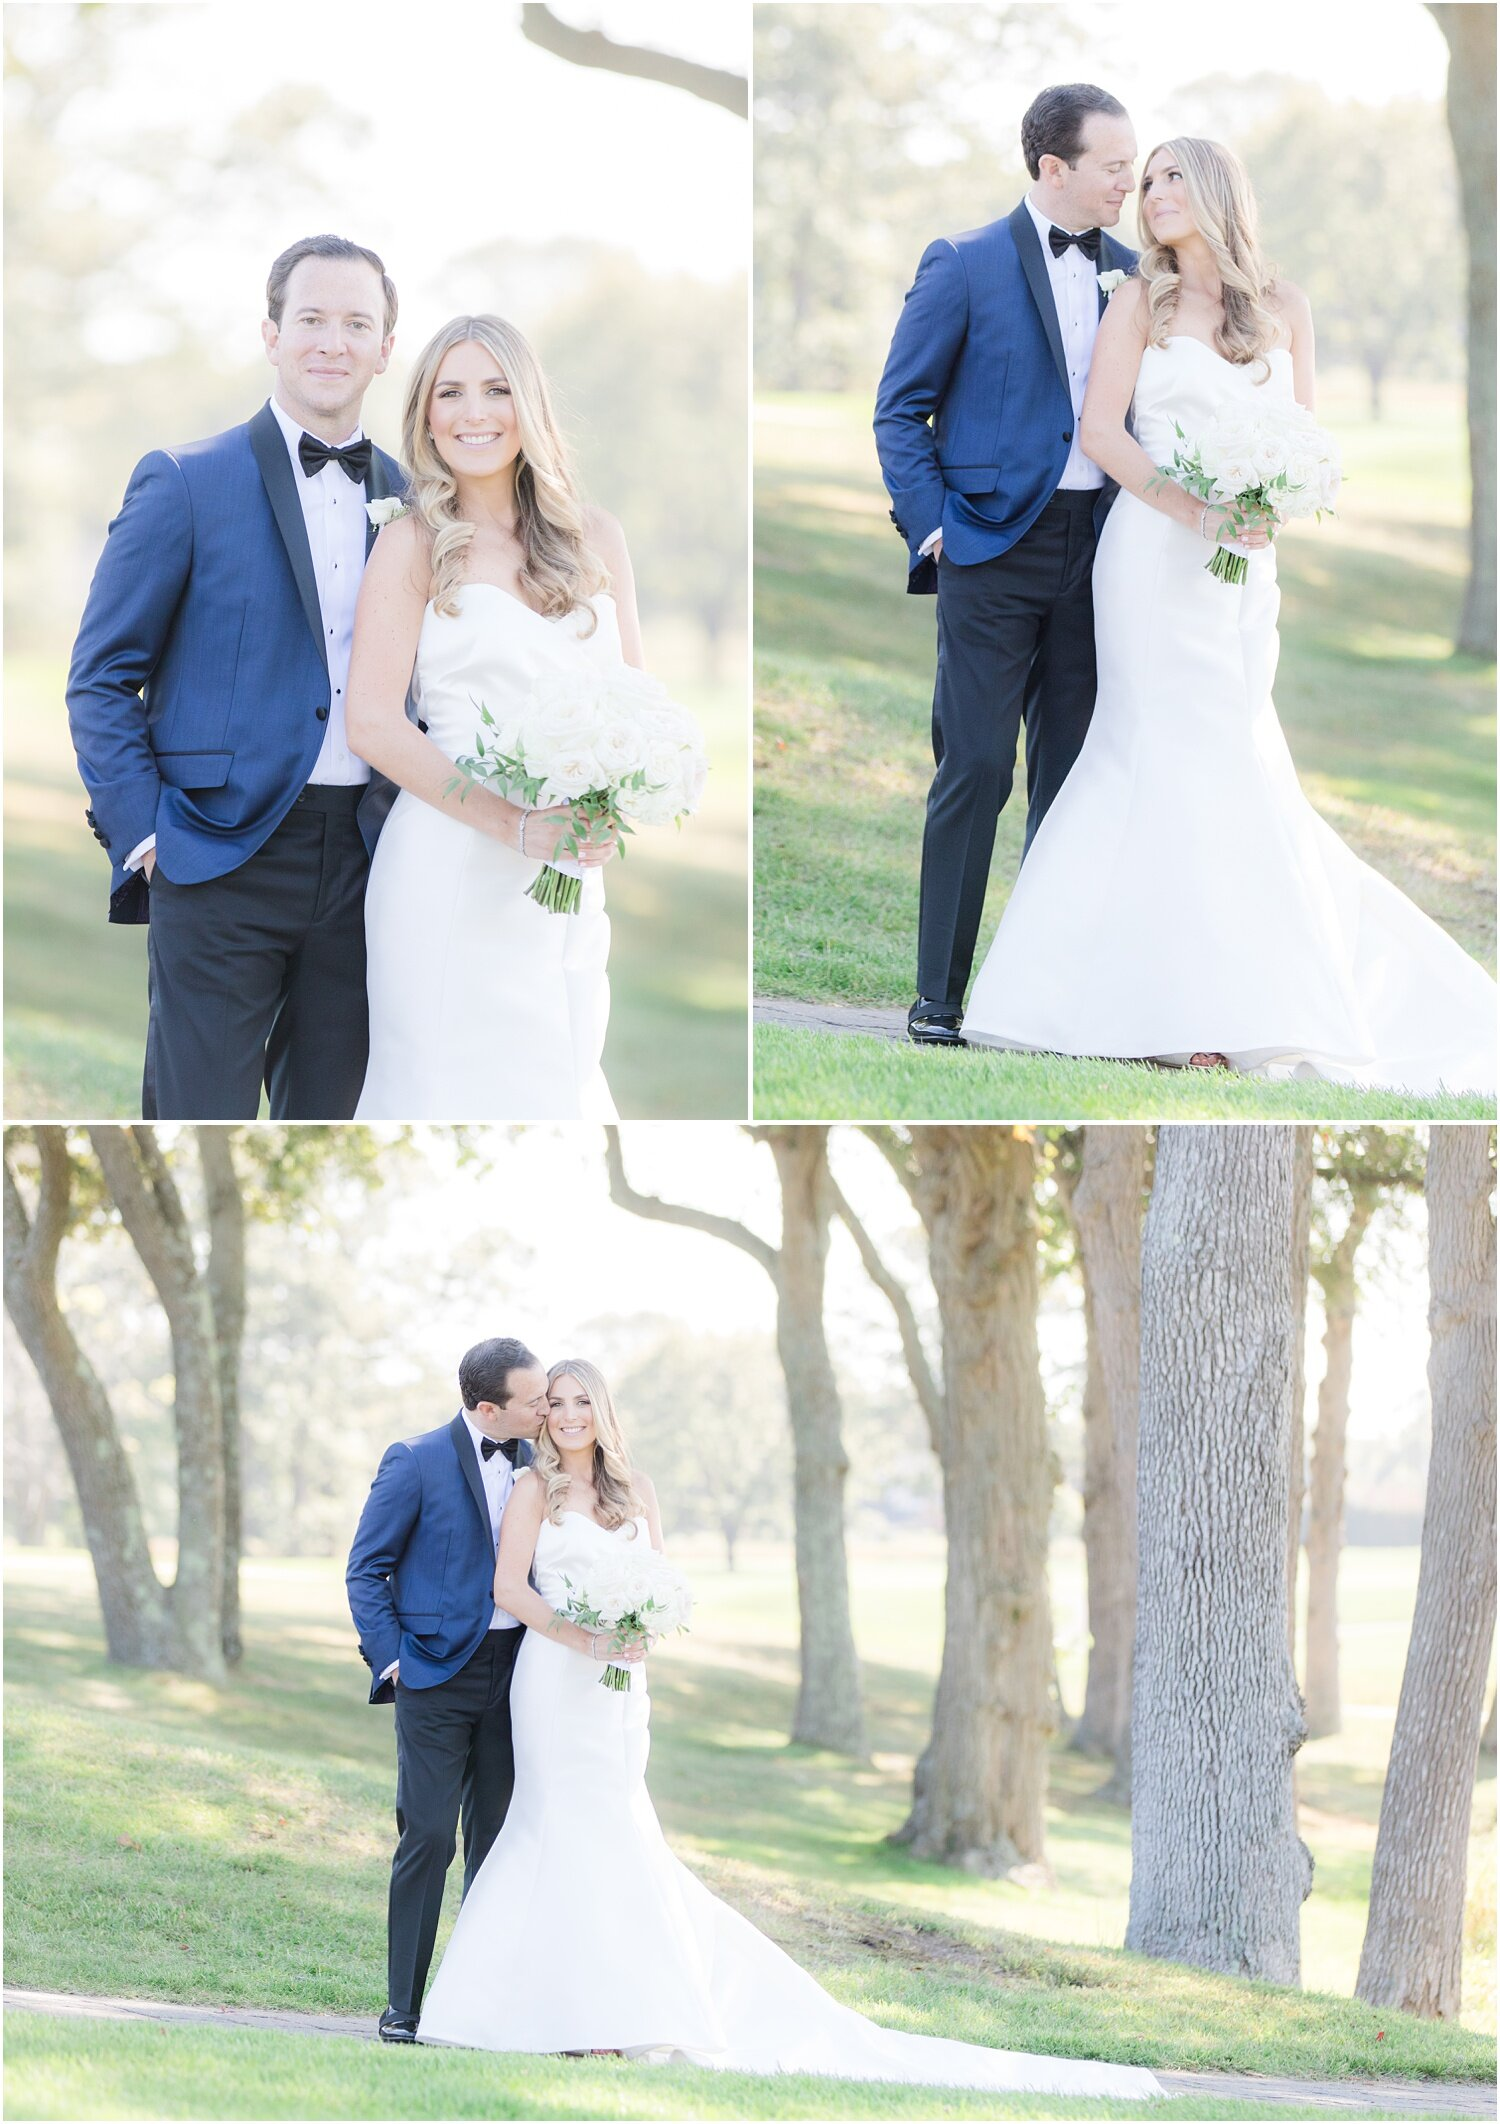 Romantic wedding photos at Spring Lake Golf Club.